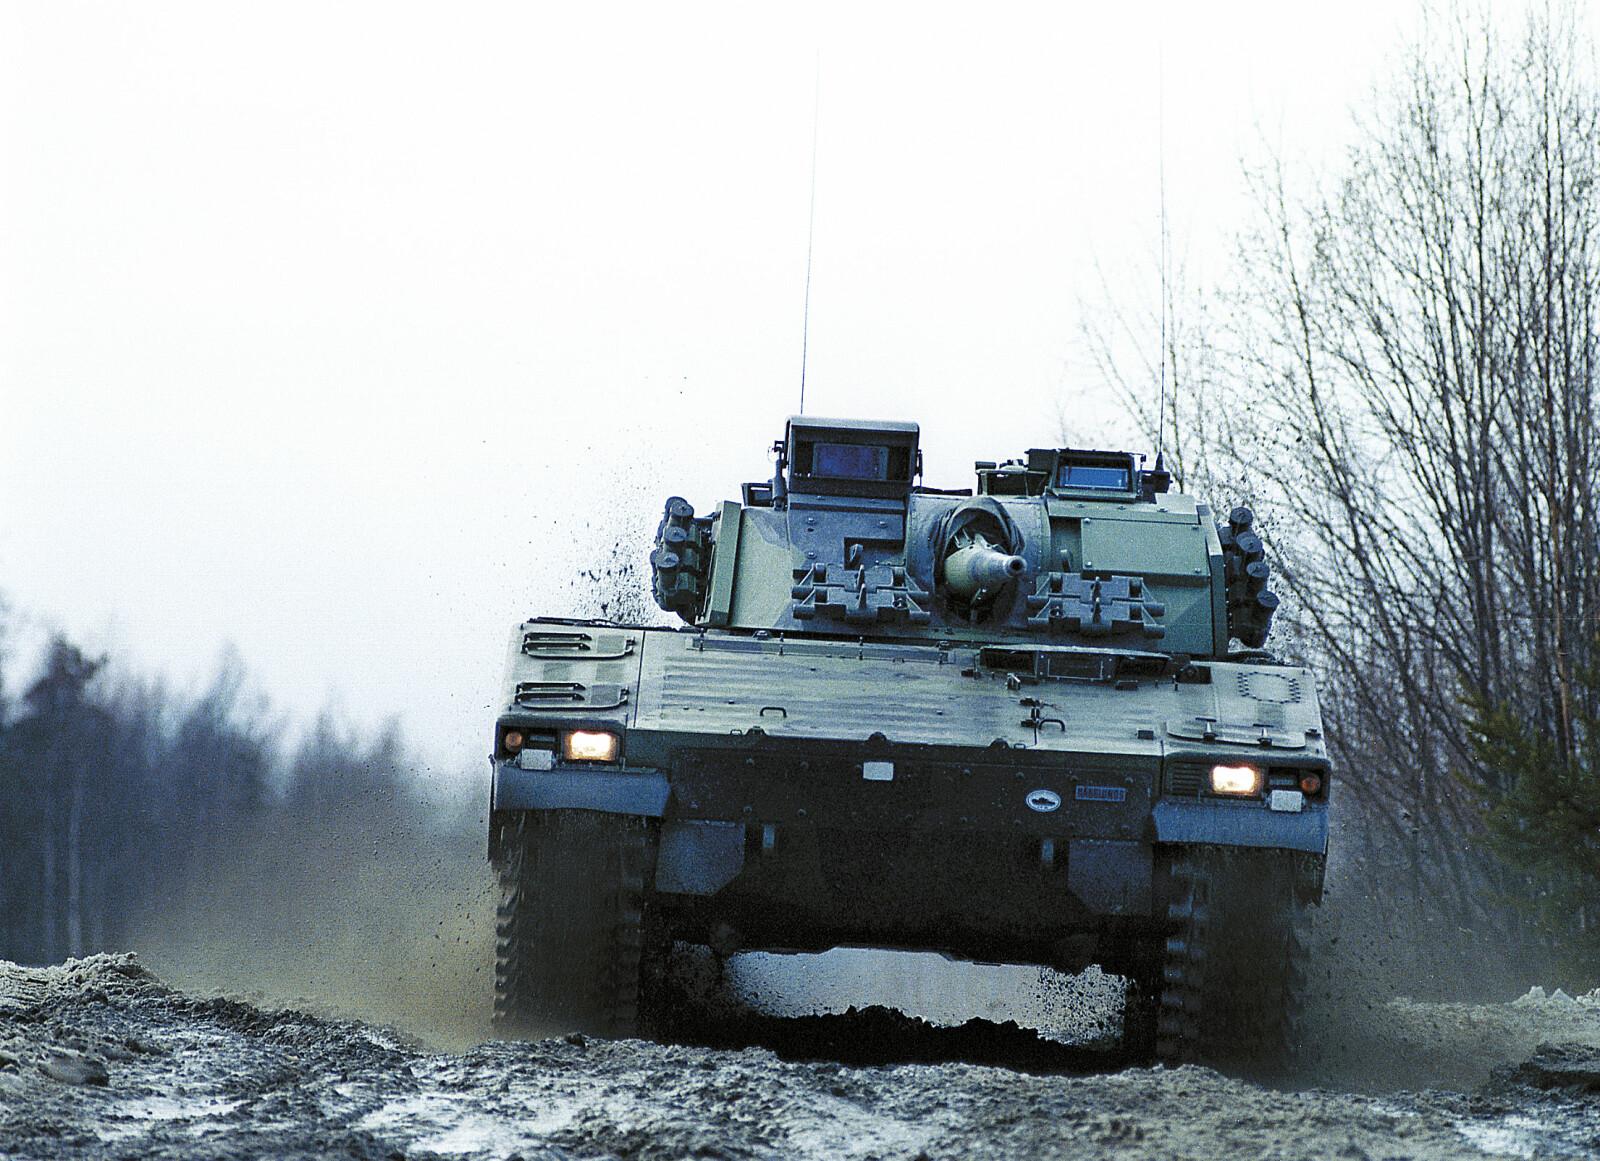 <b>TEST: </b>Testing av Stormpanservognen CV9030 på Hägglunds fabrikker i Örnsköldsvik i Sverige.